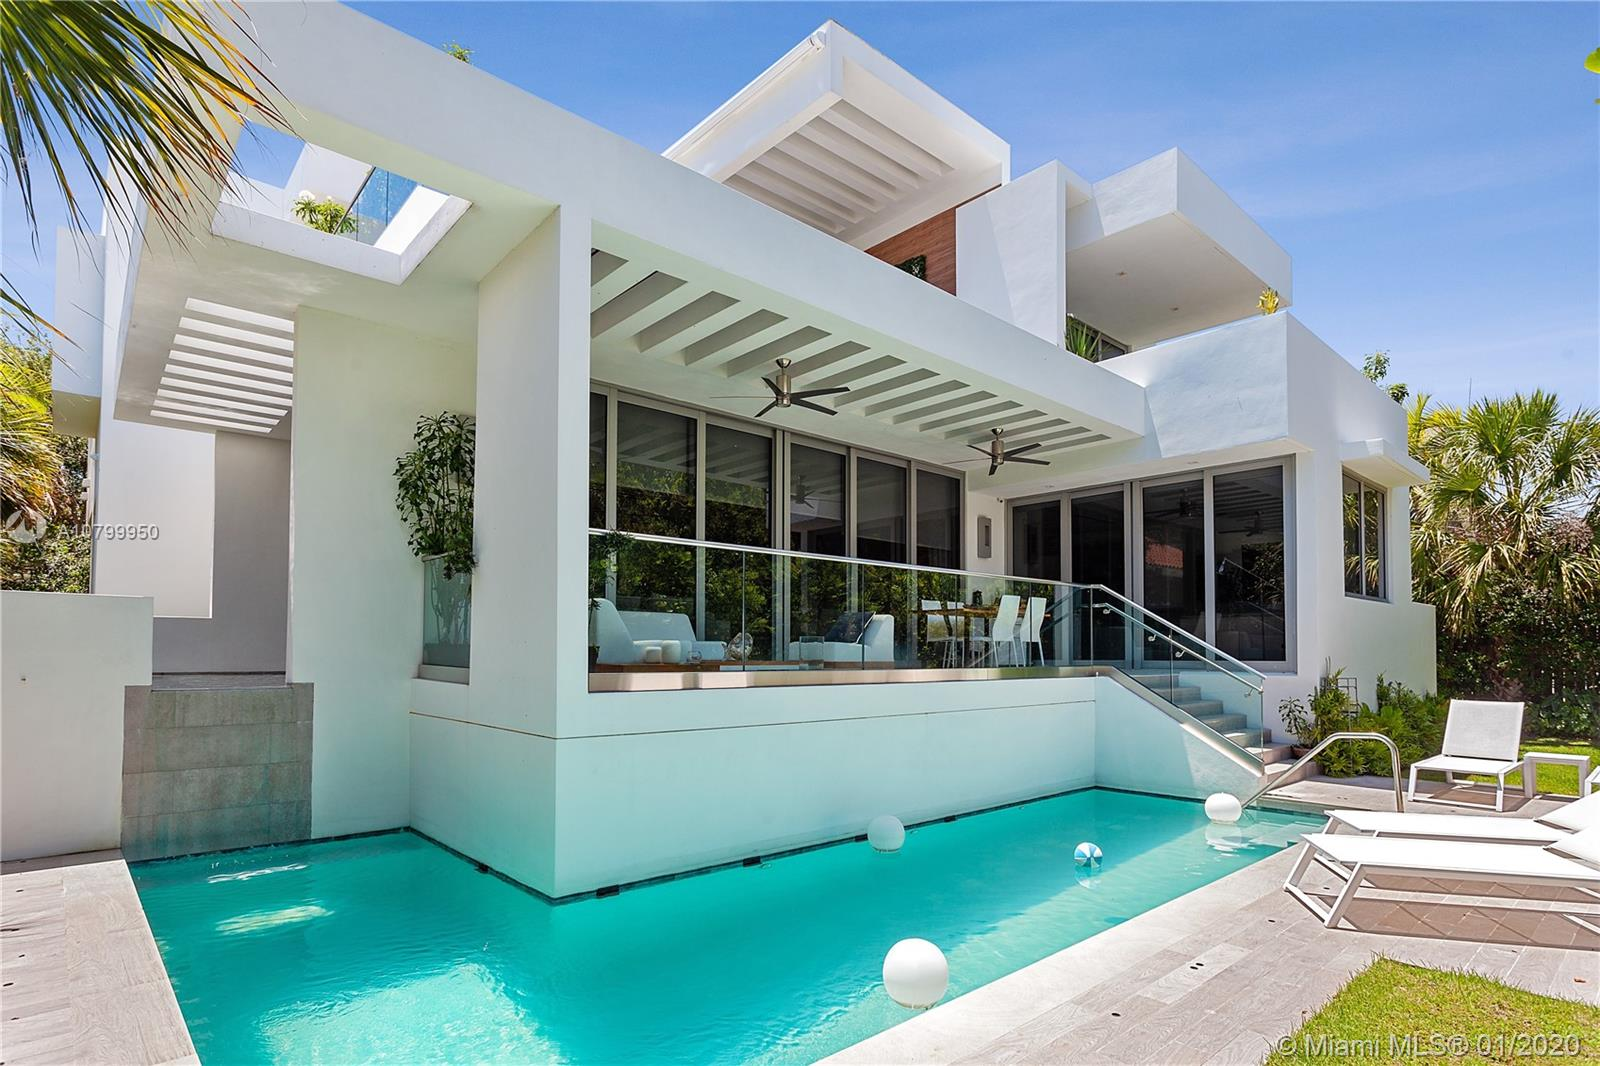 761 Glenridge Rd, Key Biscayne, Florida